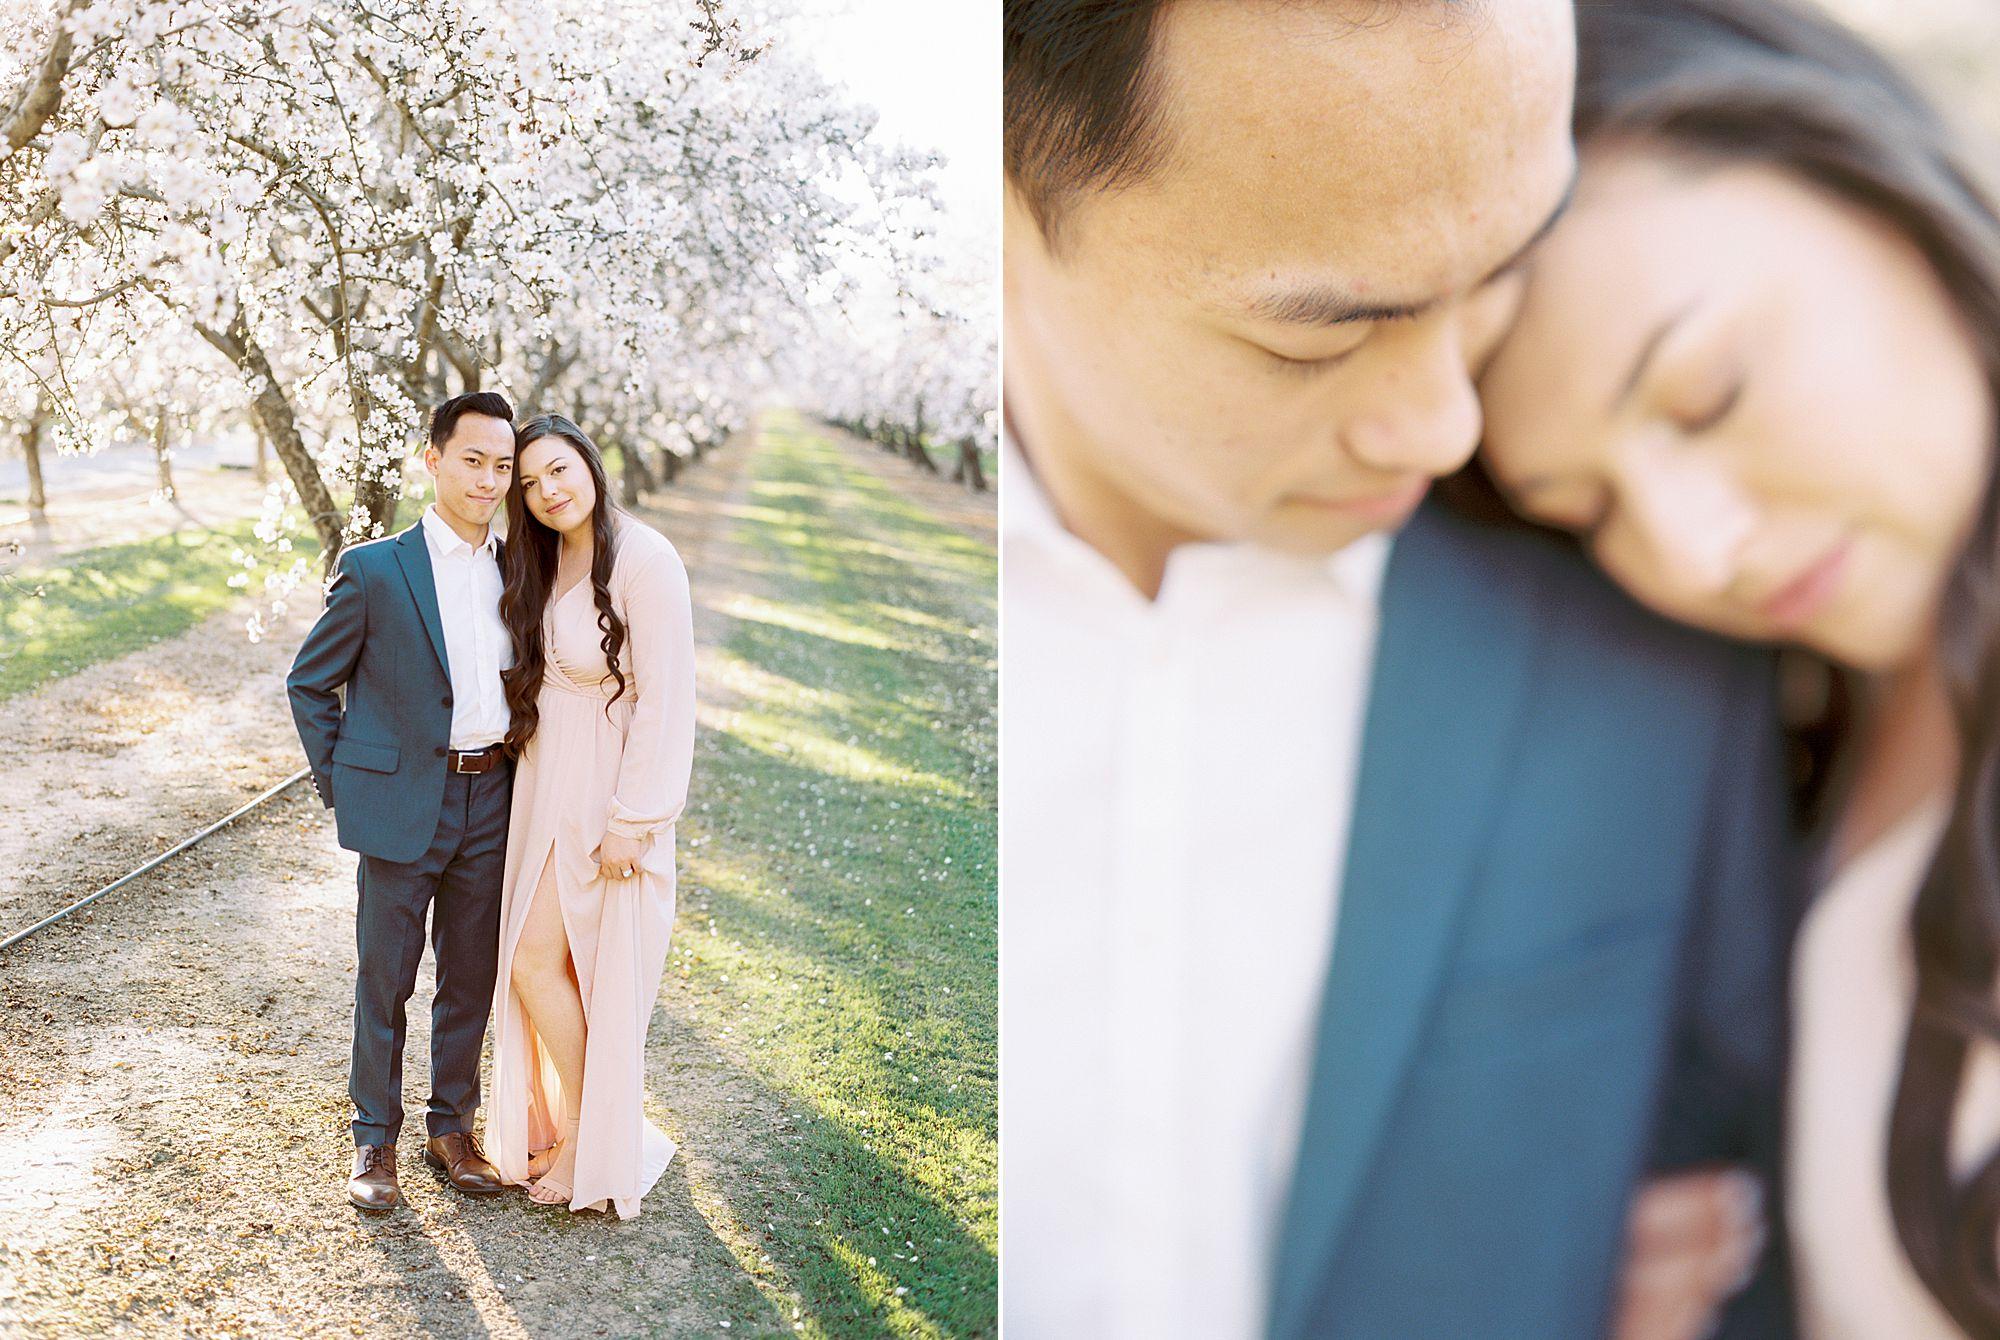 Almond Orchard Engagement Session - Caley and Tyler - Lone Oak Wedding - Ashley Baumgartner - Almond Blossom_0013.jpg